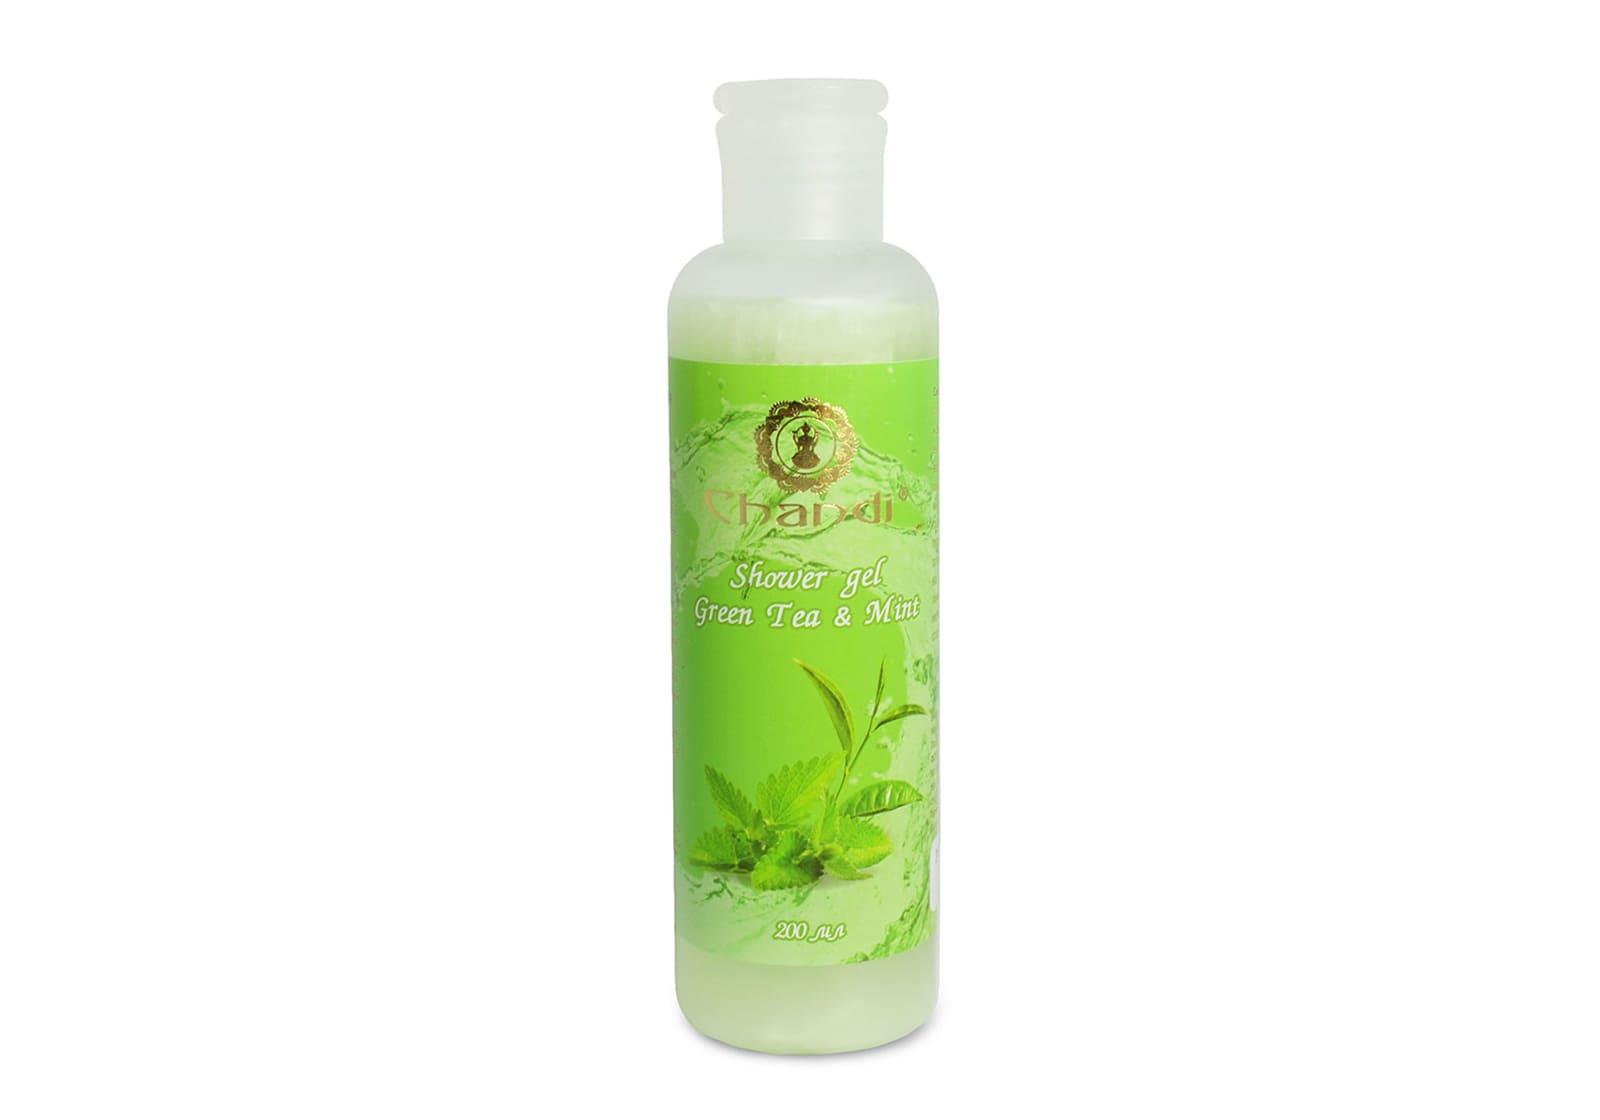 Фото Индийский гель для душа «Green Tea & Mint» Chandi 200 мл